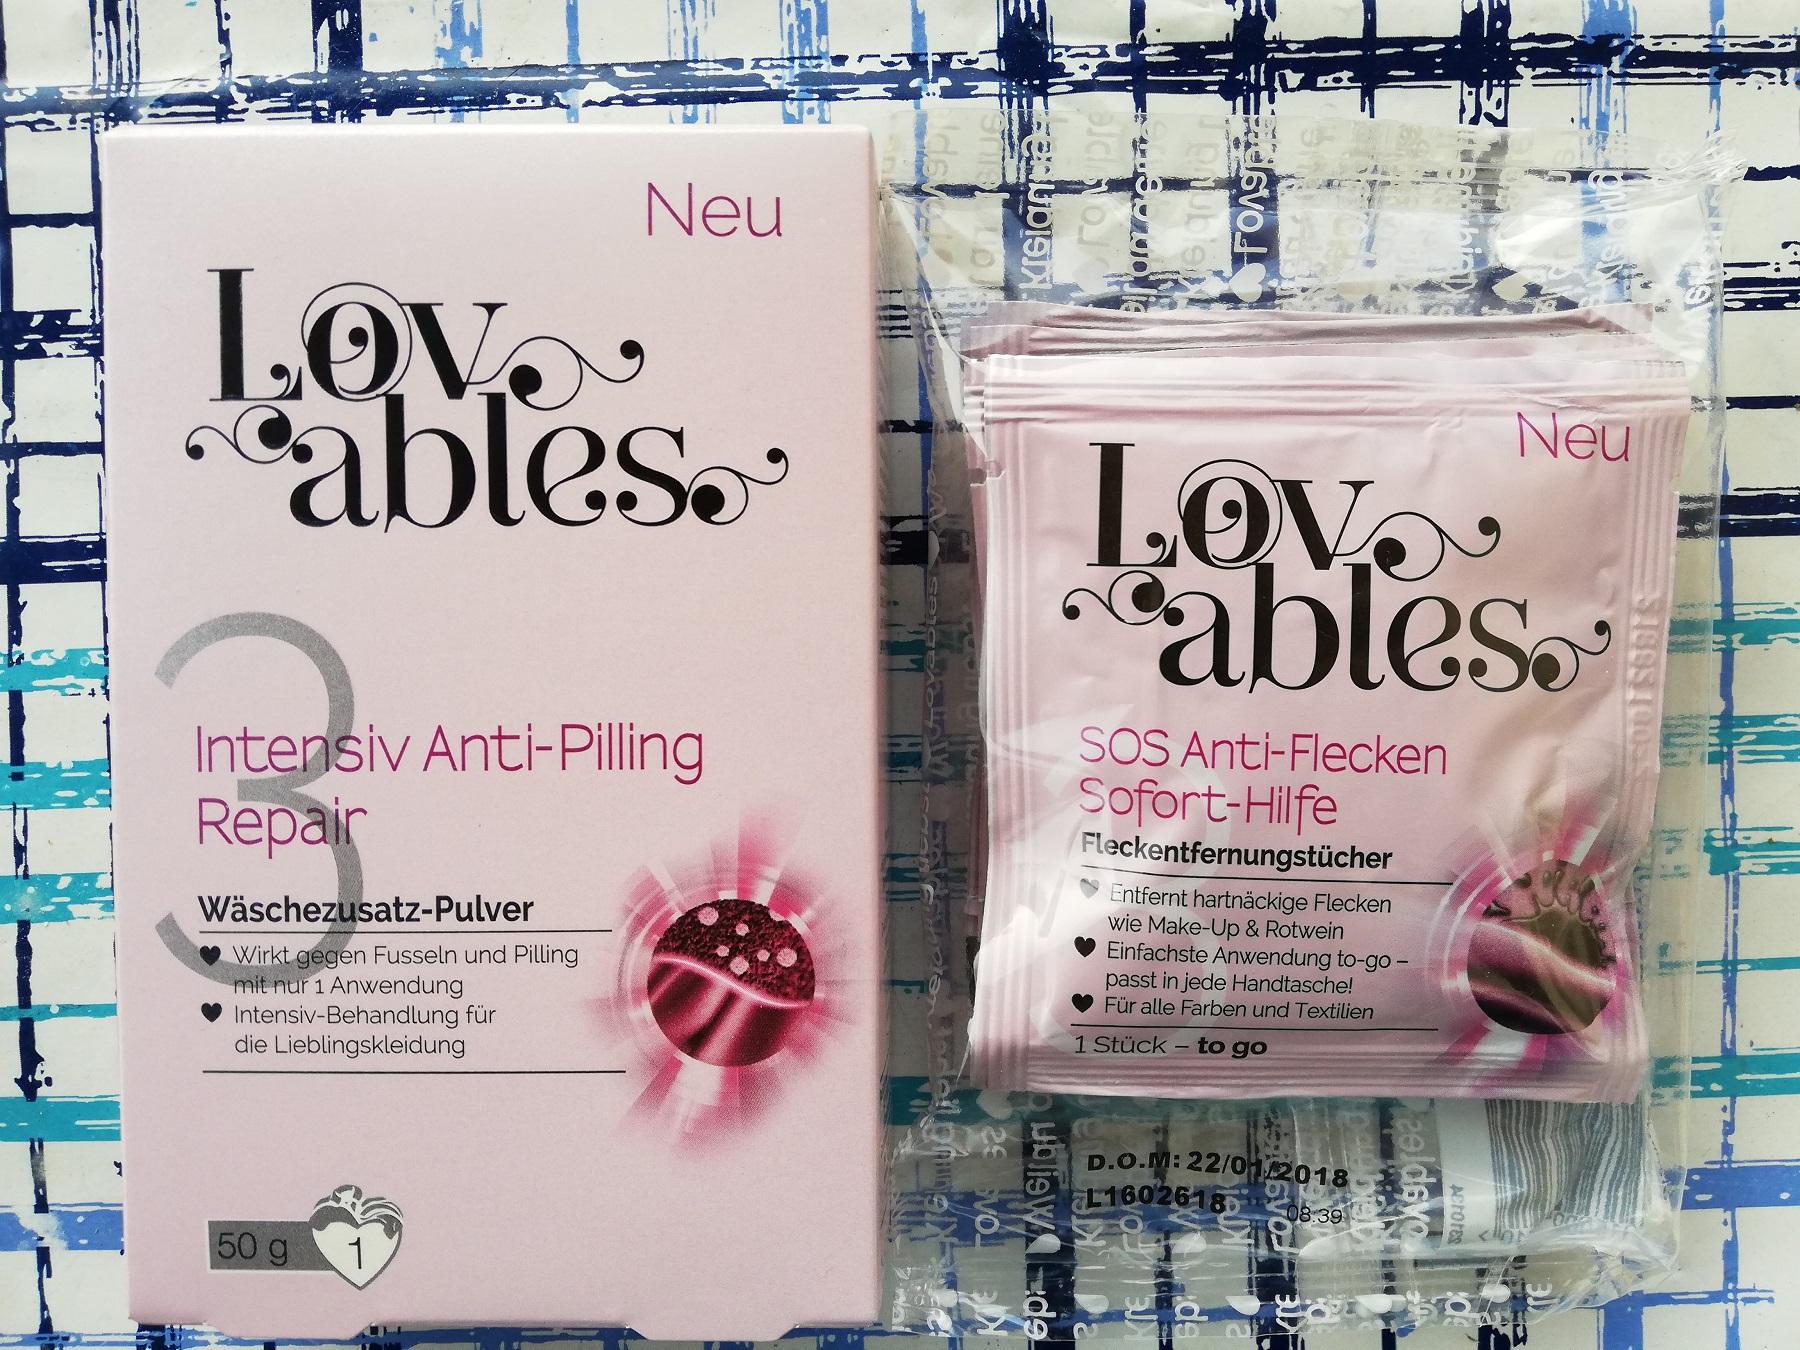 [ROSSMANN] FREEBIE! Lovabels Anti Pilling 0,80€ & SOS Tücher 1,10€ GL-Preis / 4€ Coupon